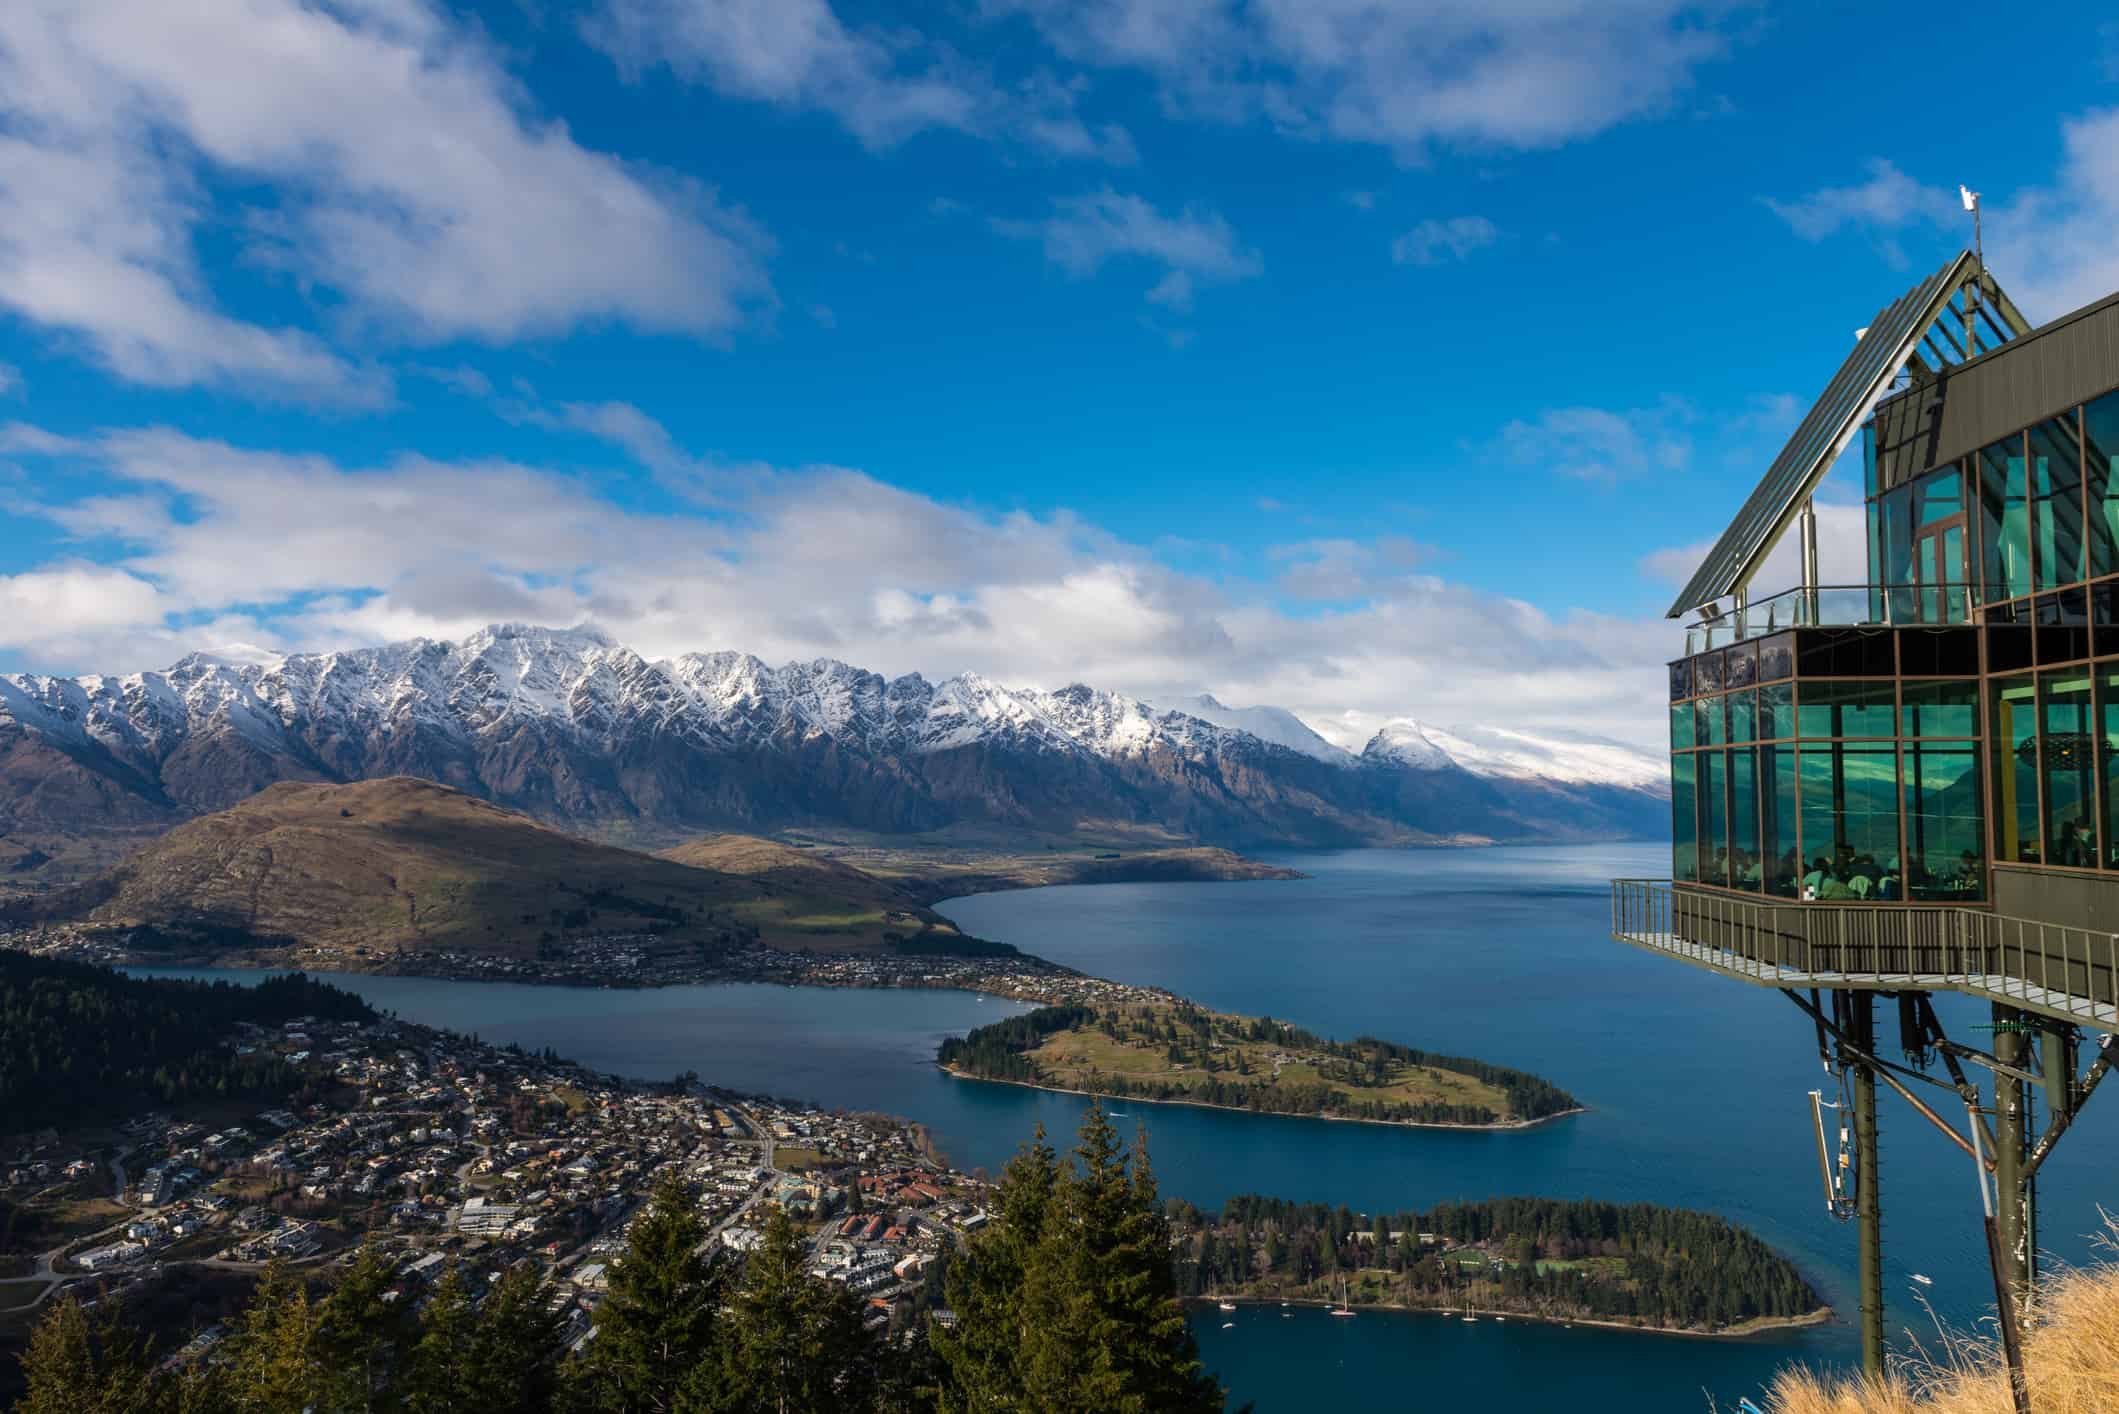 Skyline complex, Queenstown, Otago, New Zealand